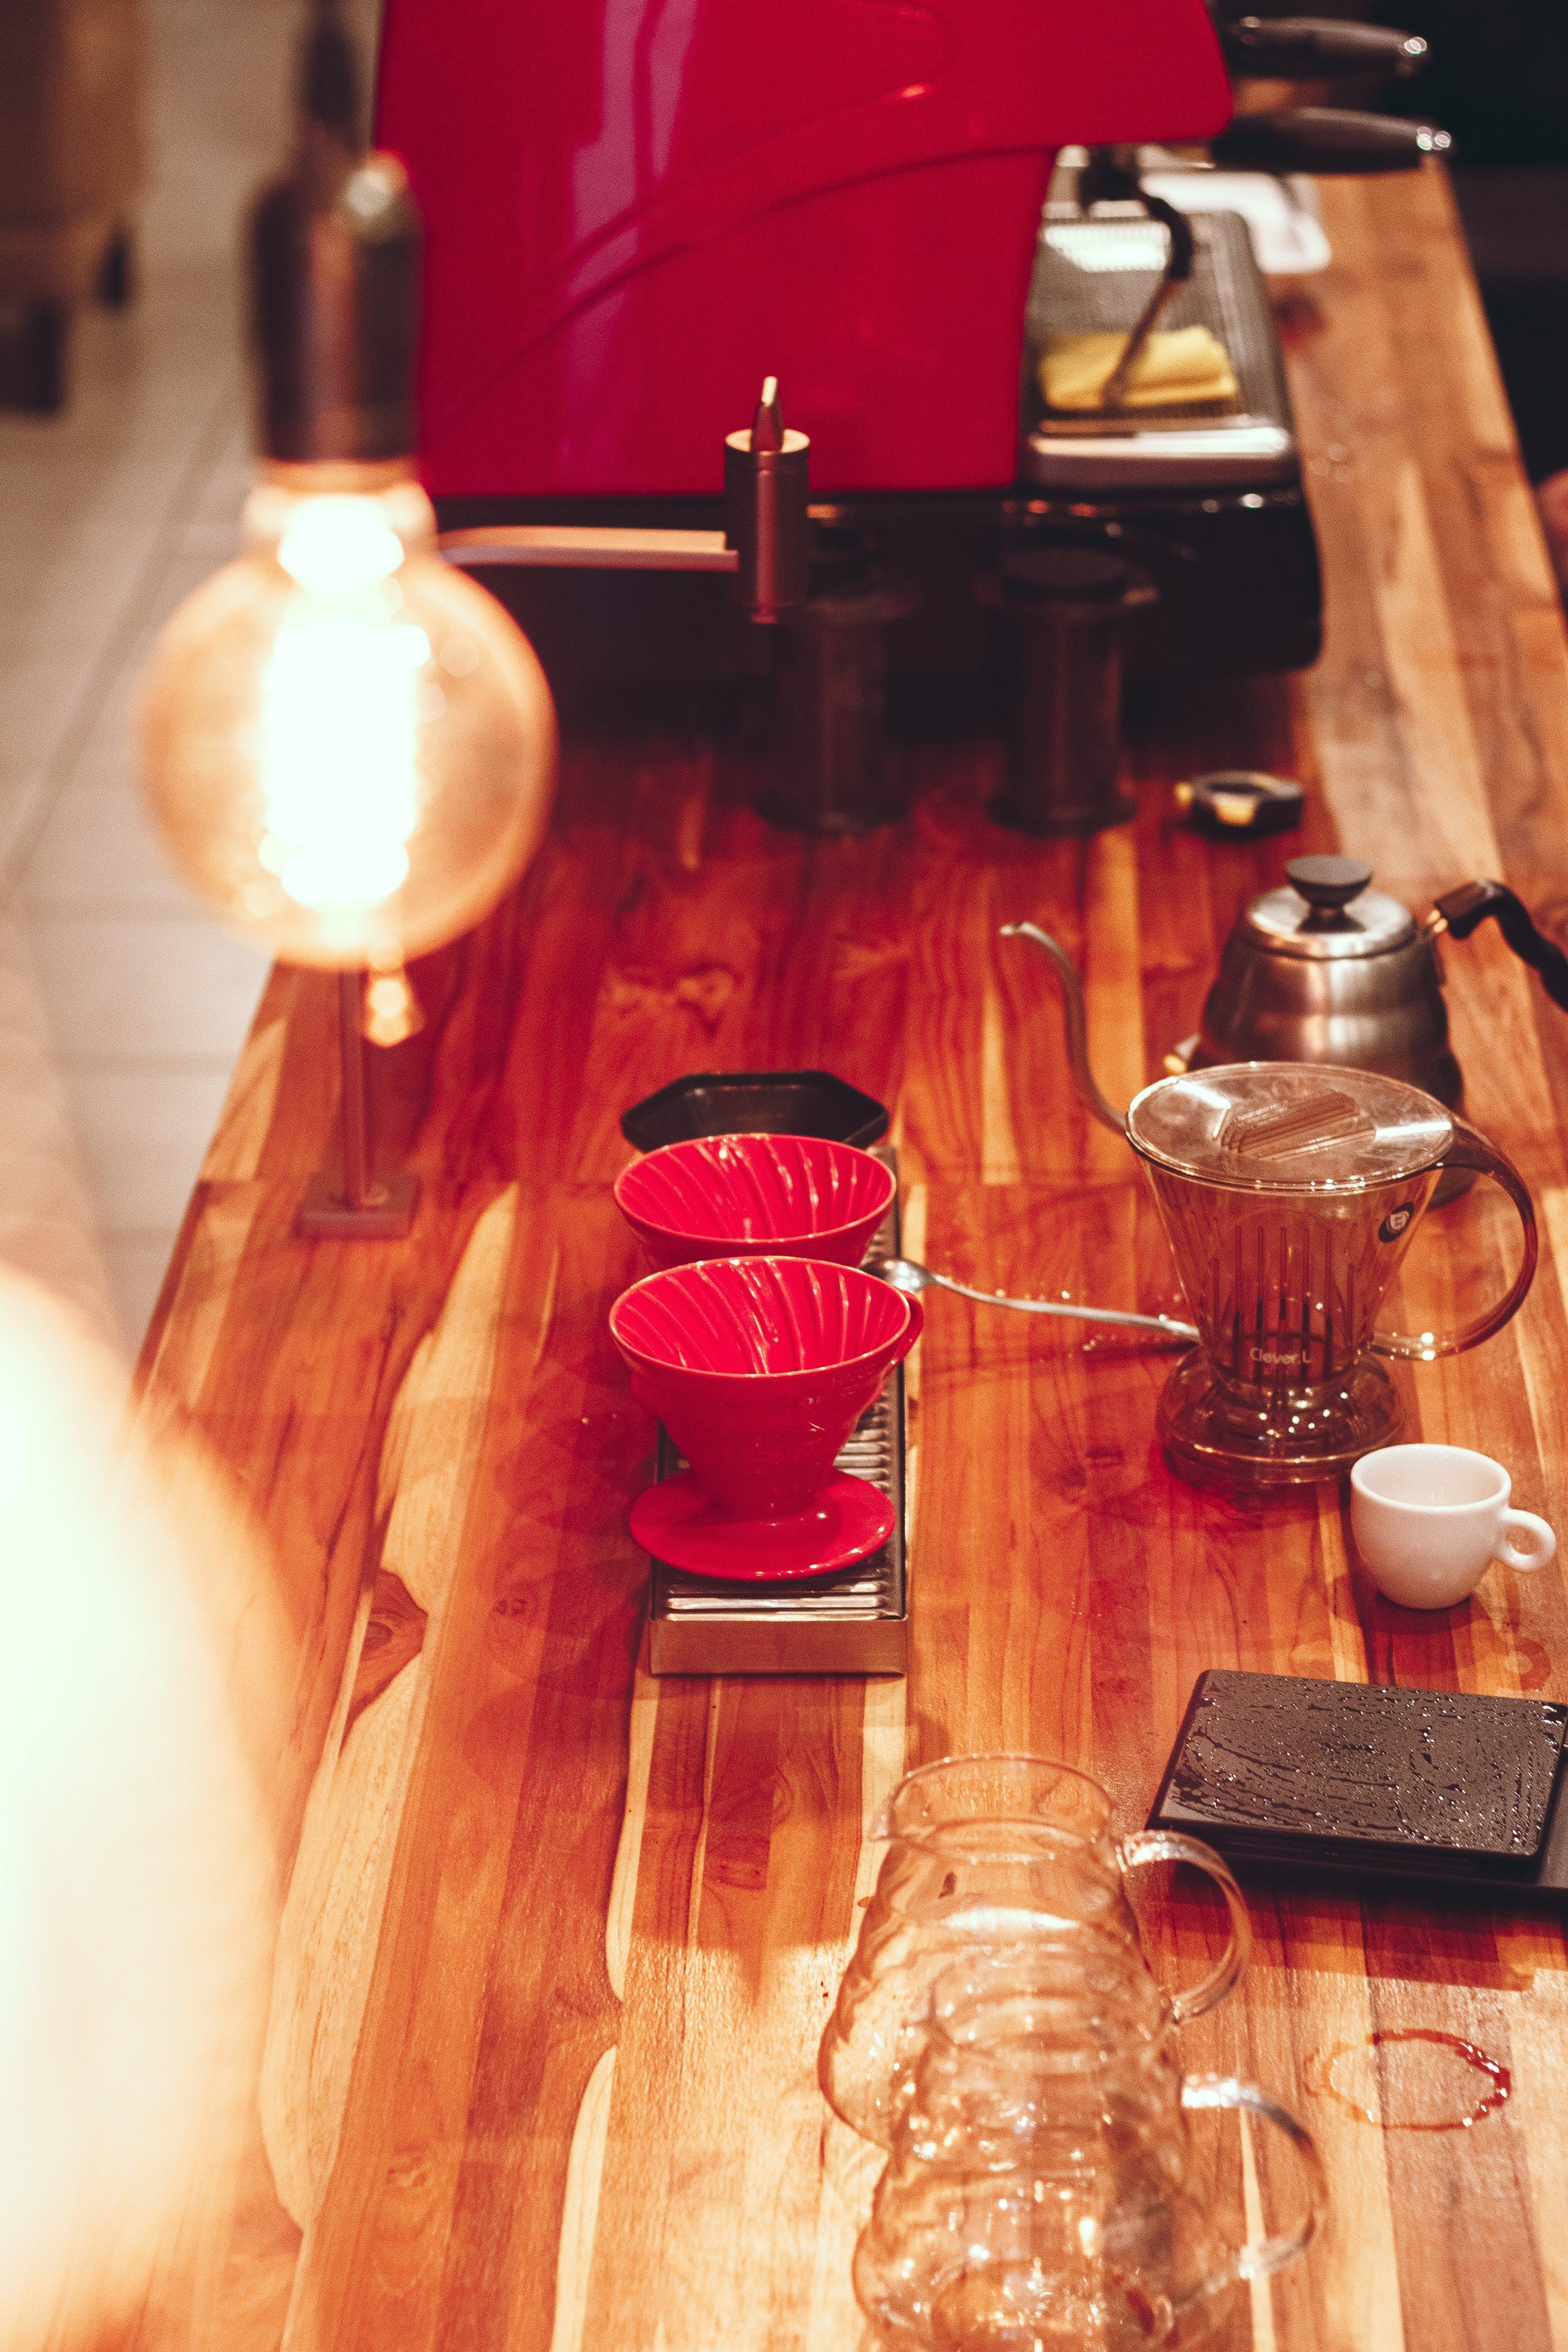 of black coffee, café, coffee, coffee tabble